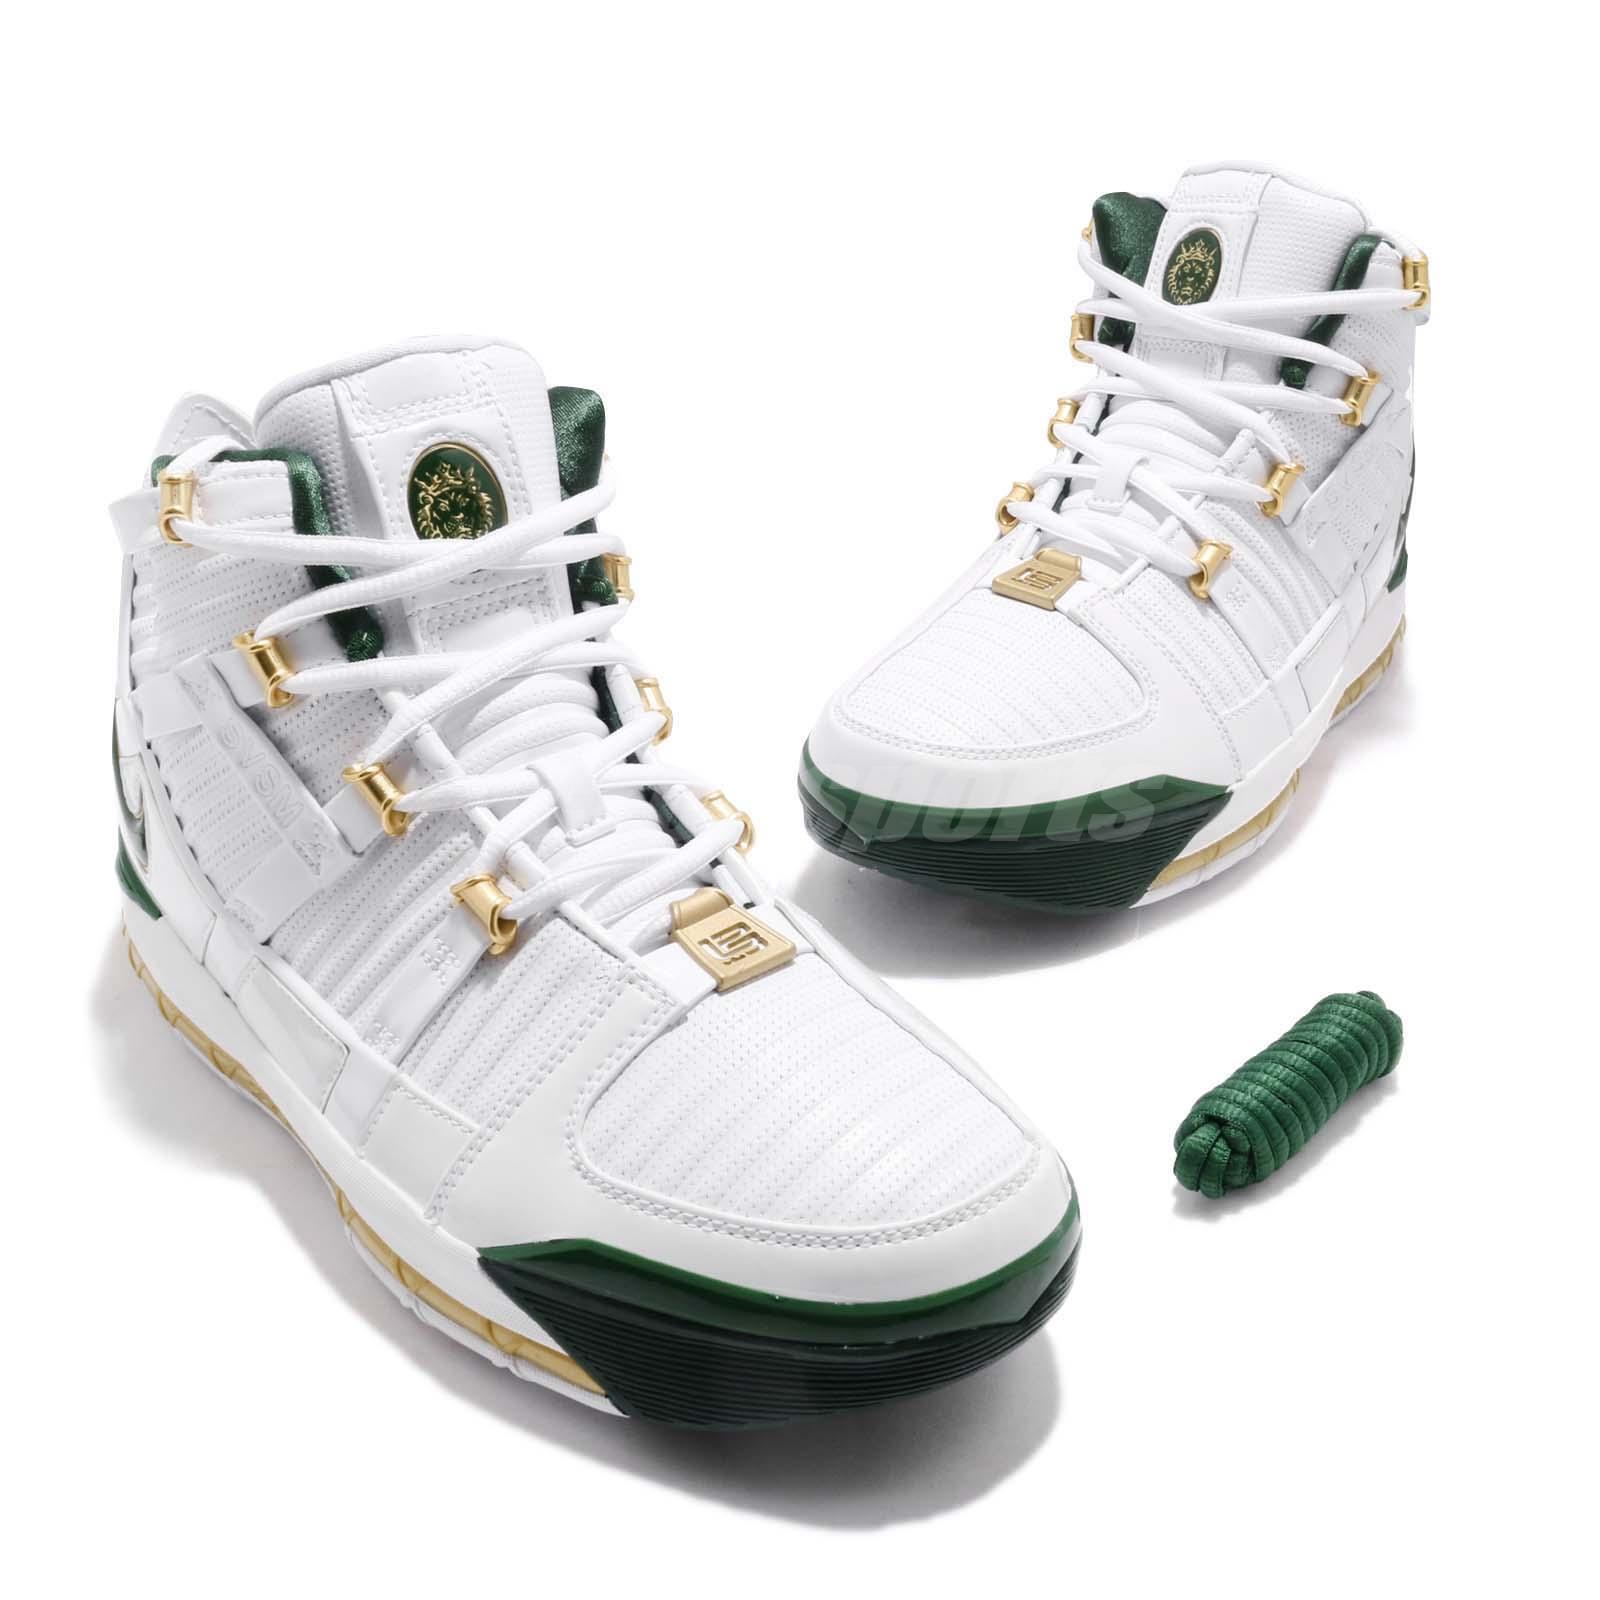 69504653cd20 Nike Zoom Lebron III QS SVSM Home White Green Men Basketball Shoes ...